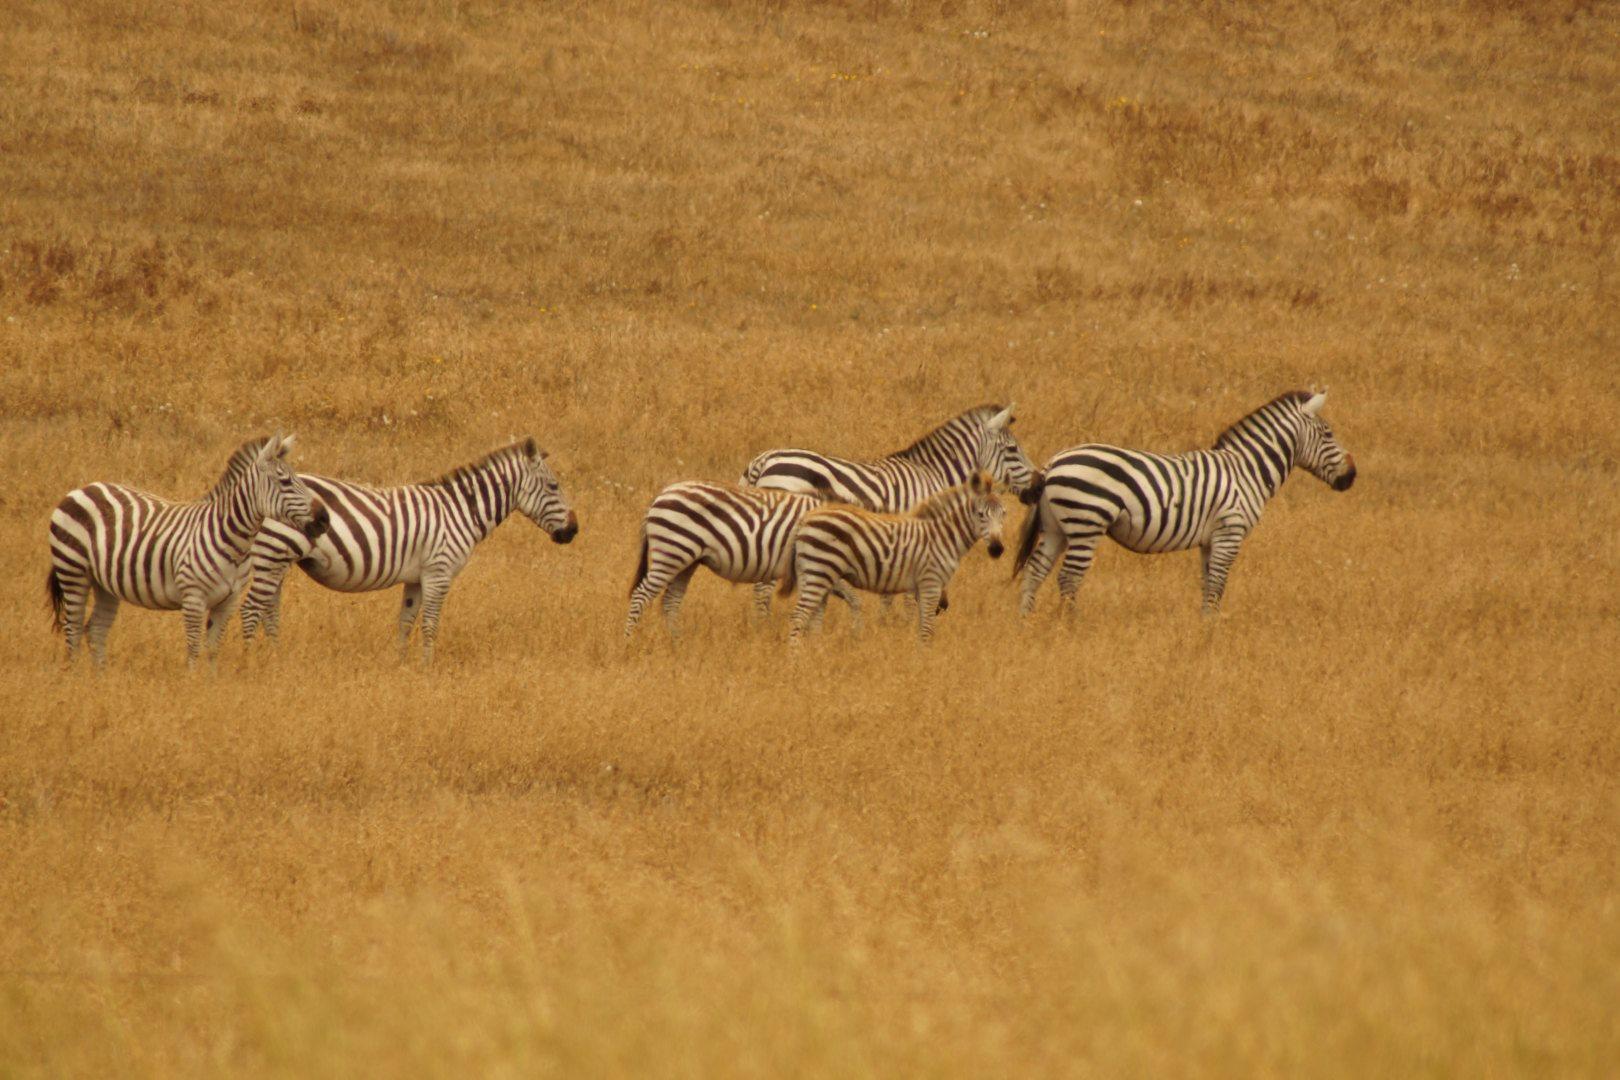 Safari am Straßenrand